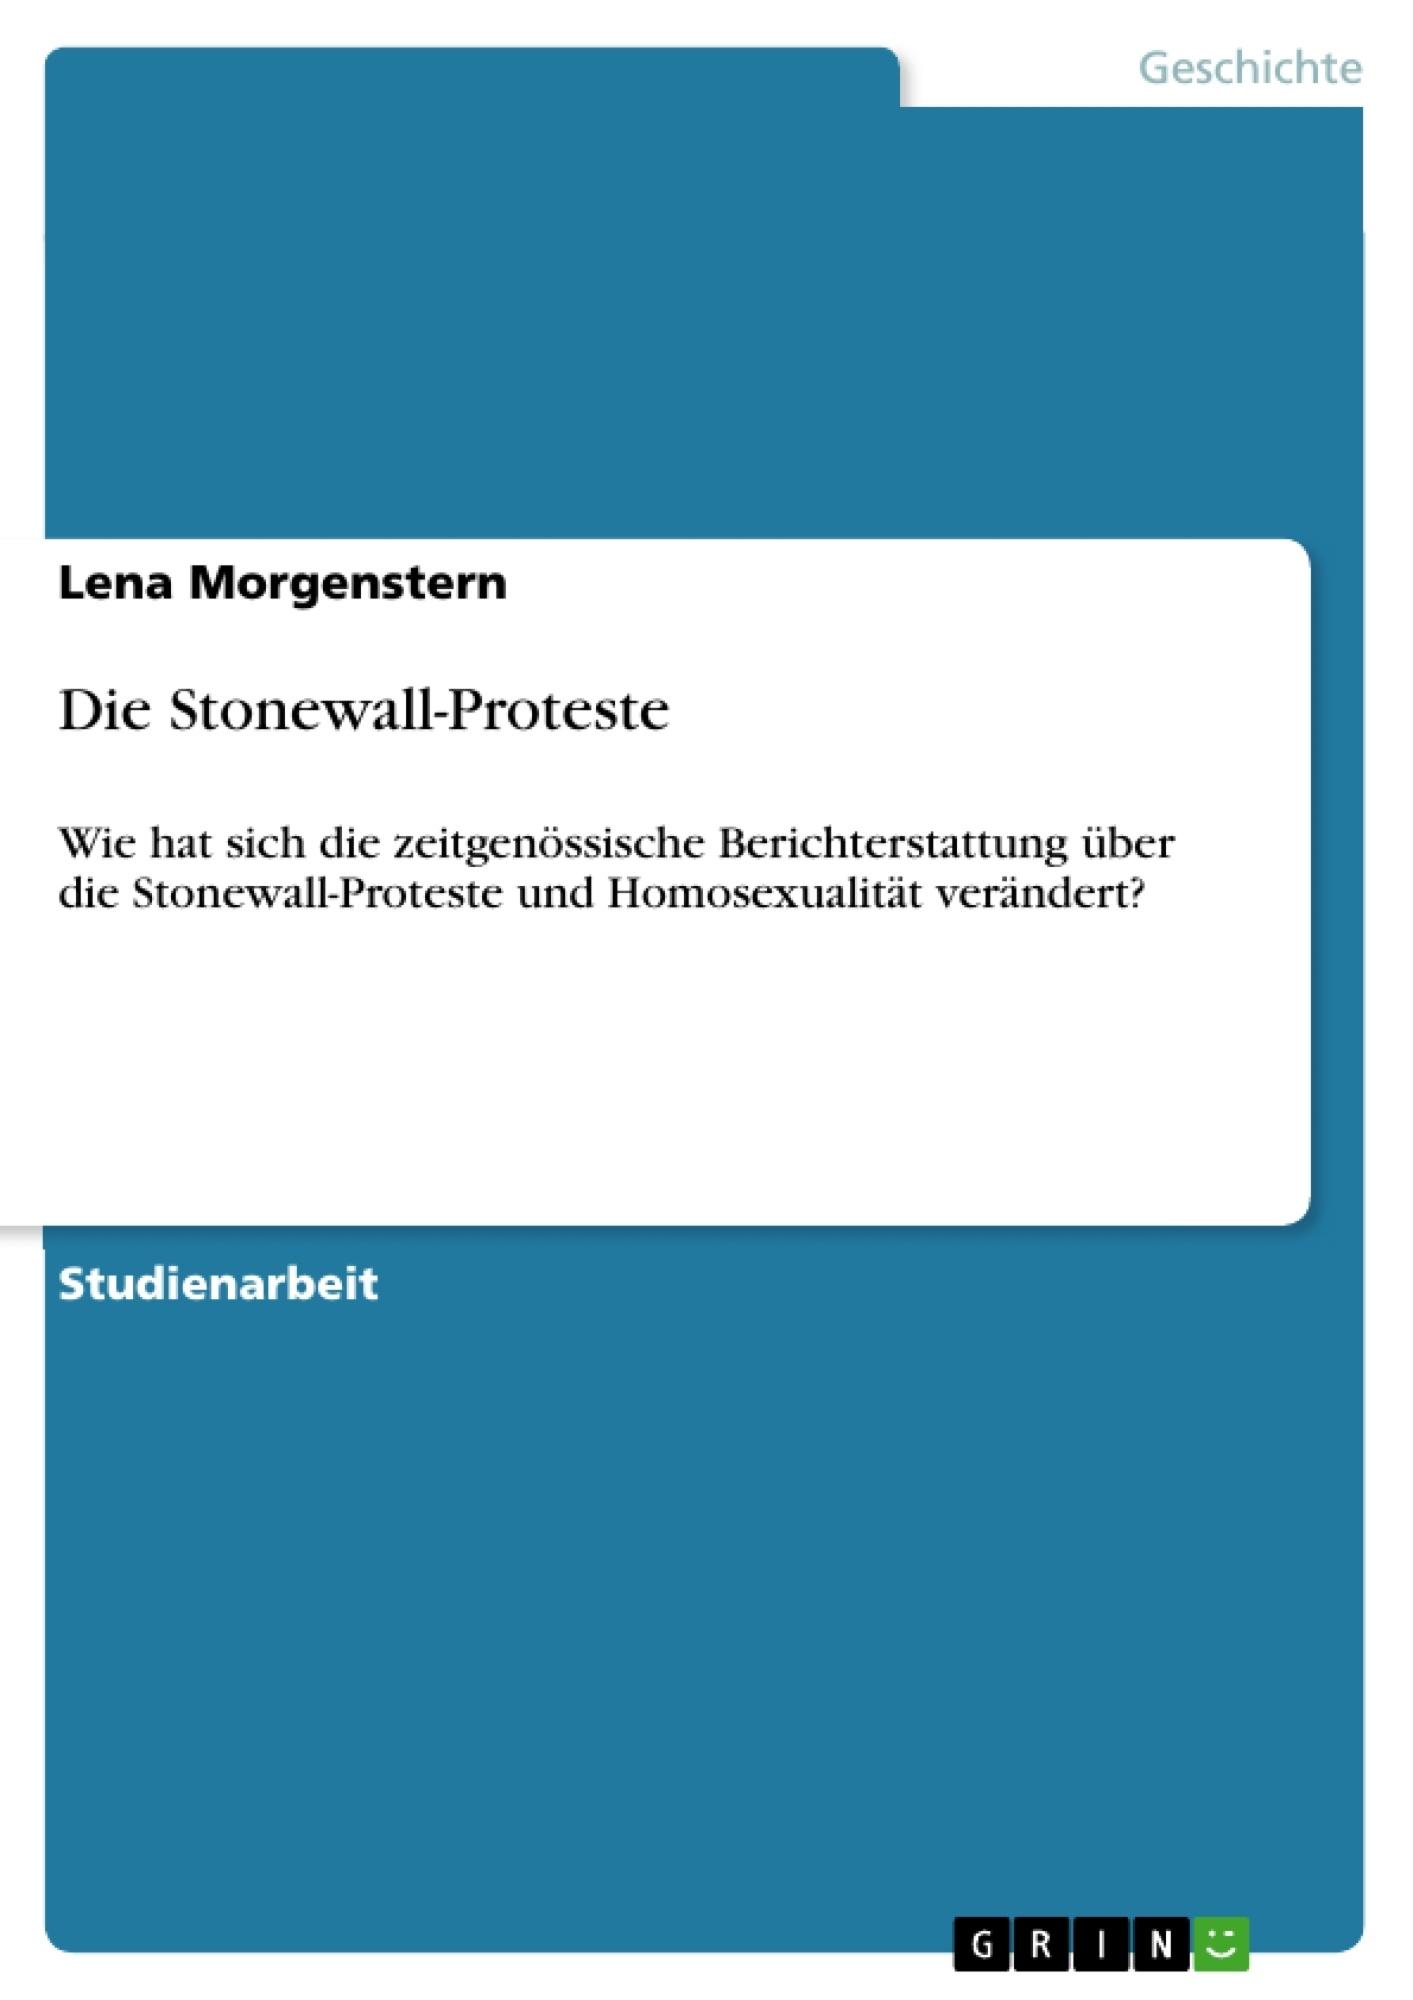 Titel: Die Stonewall-Proteste